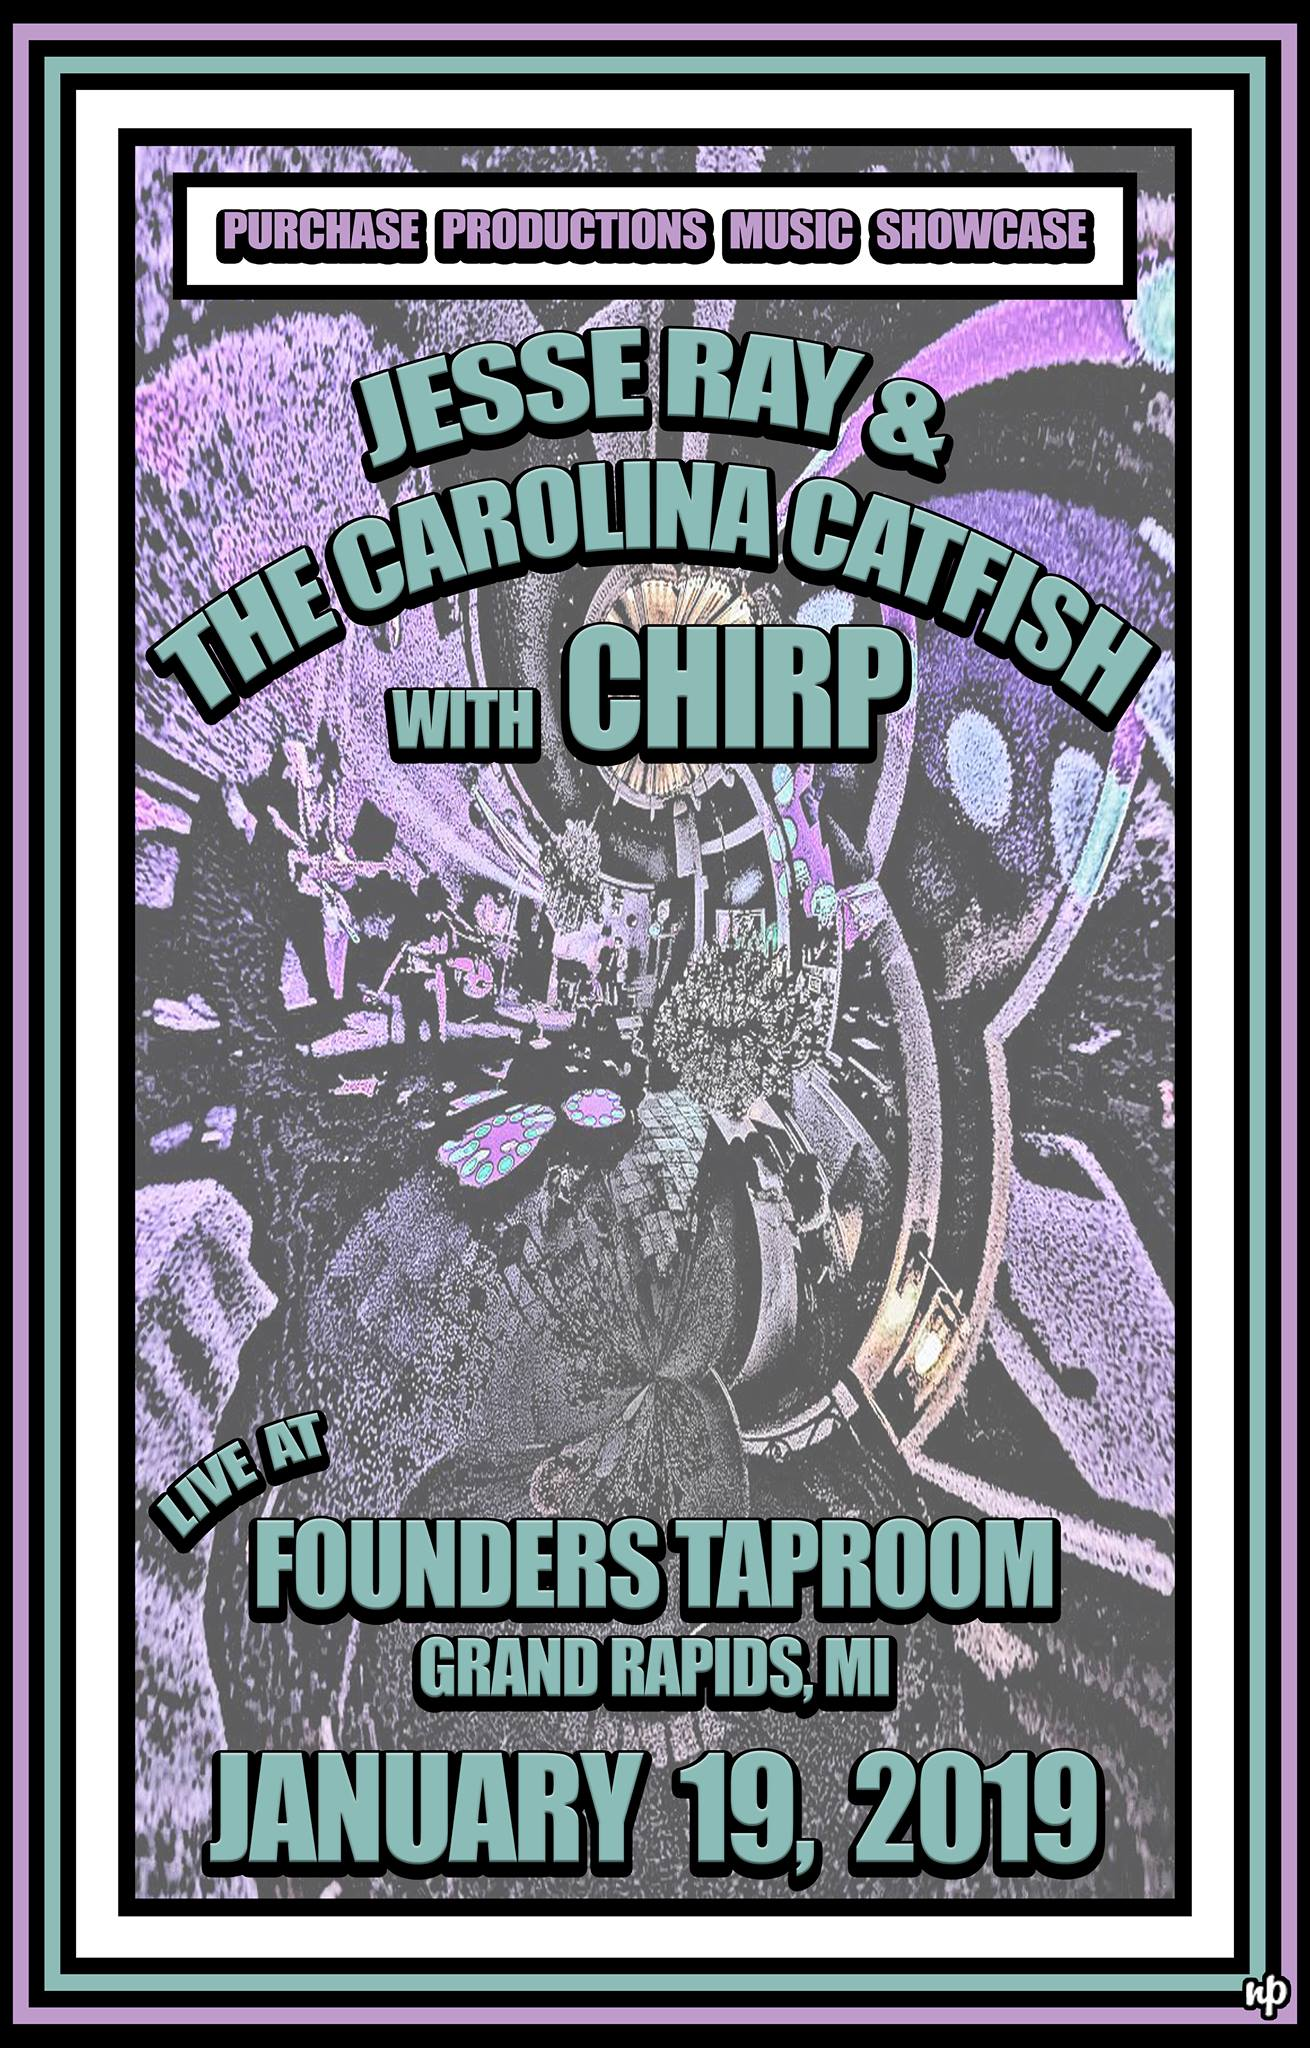 Jesse Ray & The Carolina Catfish event poster